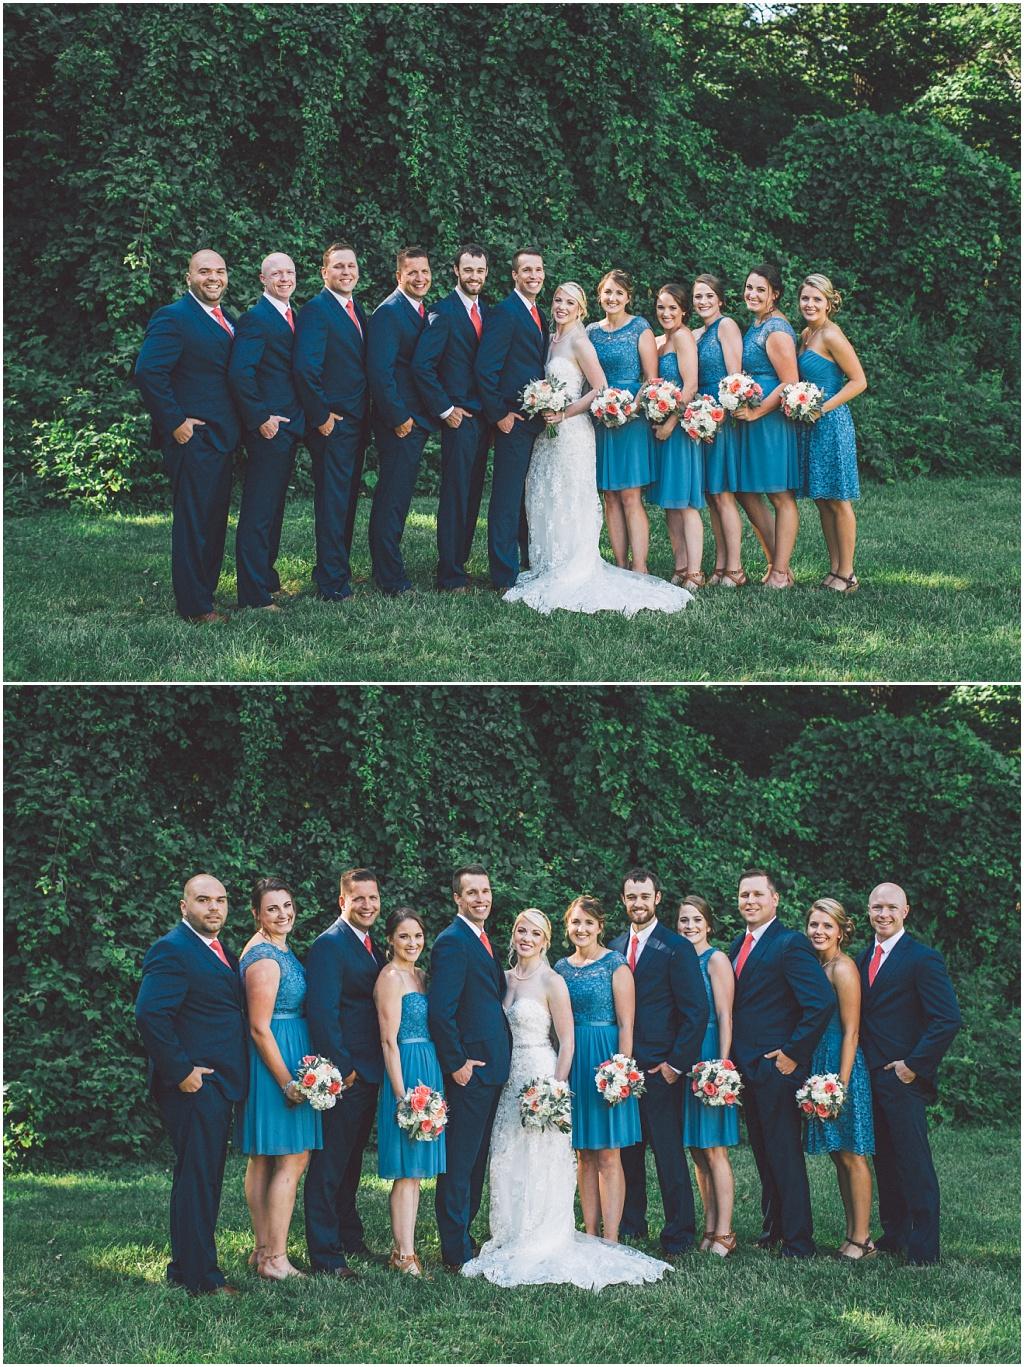 finger-lakes-wedding-photography_0167.jpg